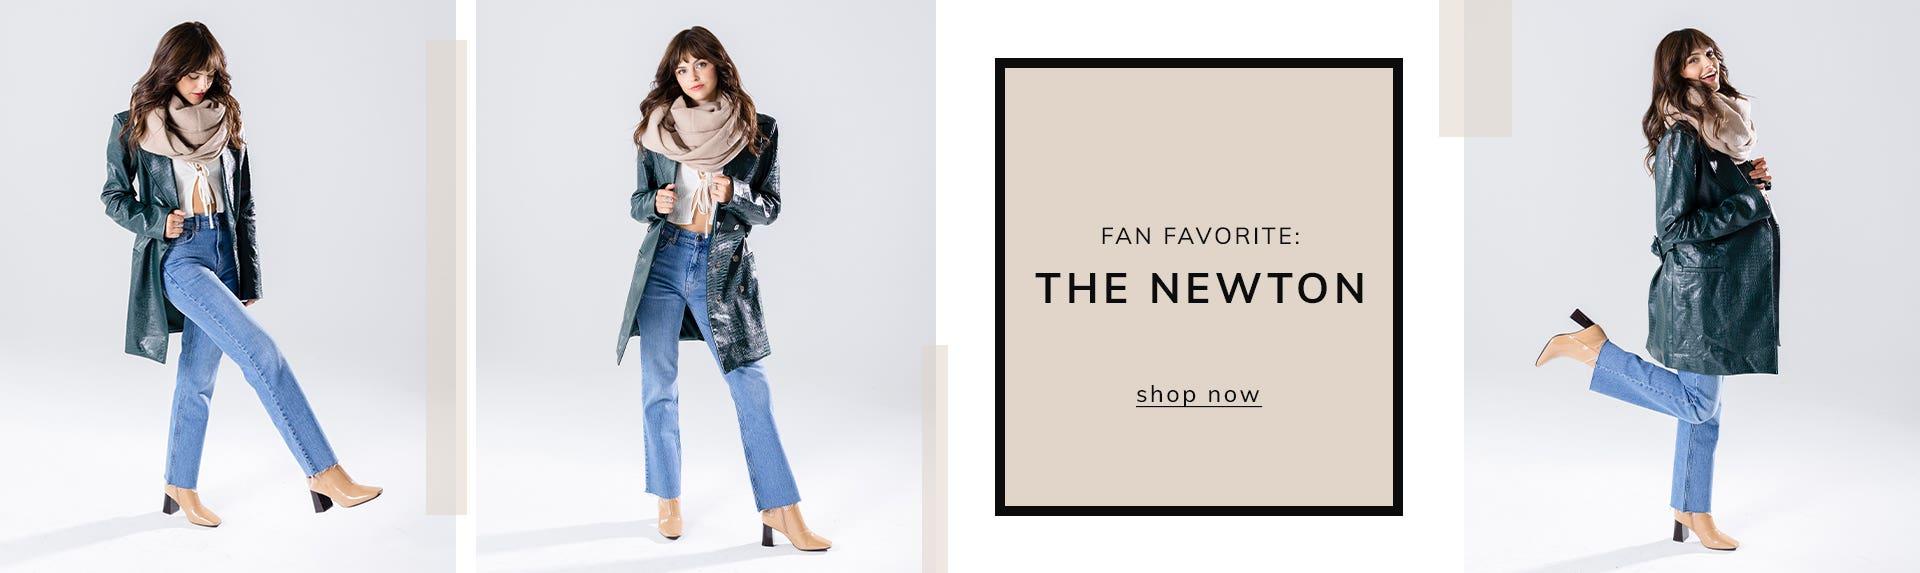 FAN FAVORITE: The Newton | Shop Now